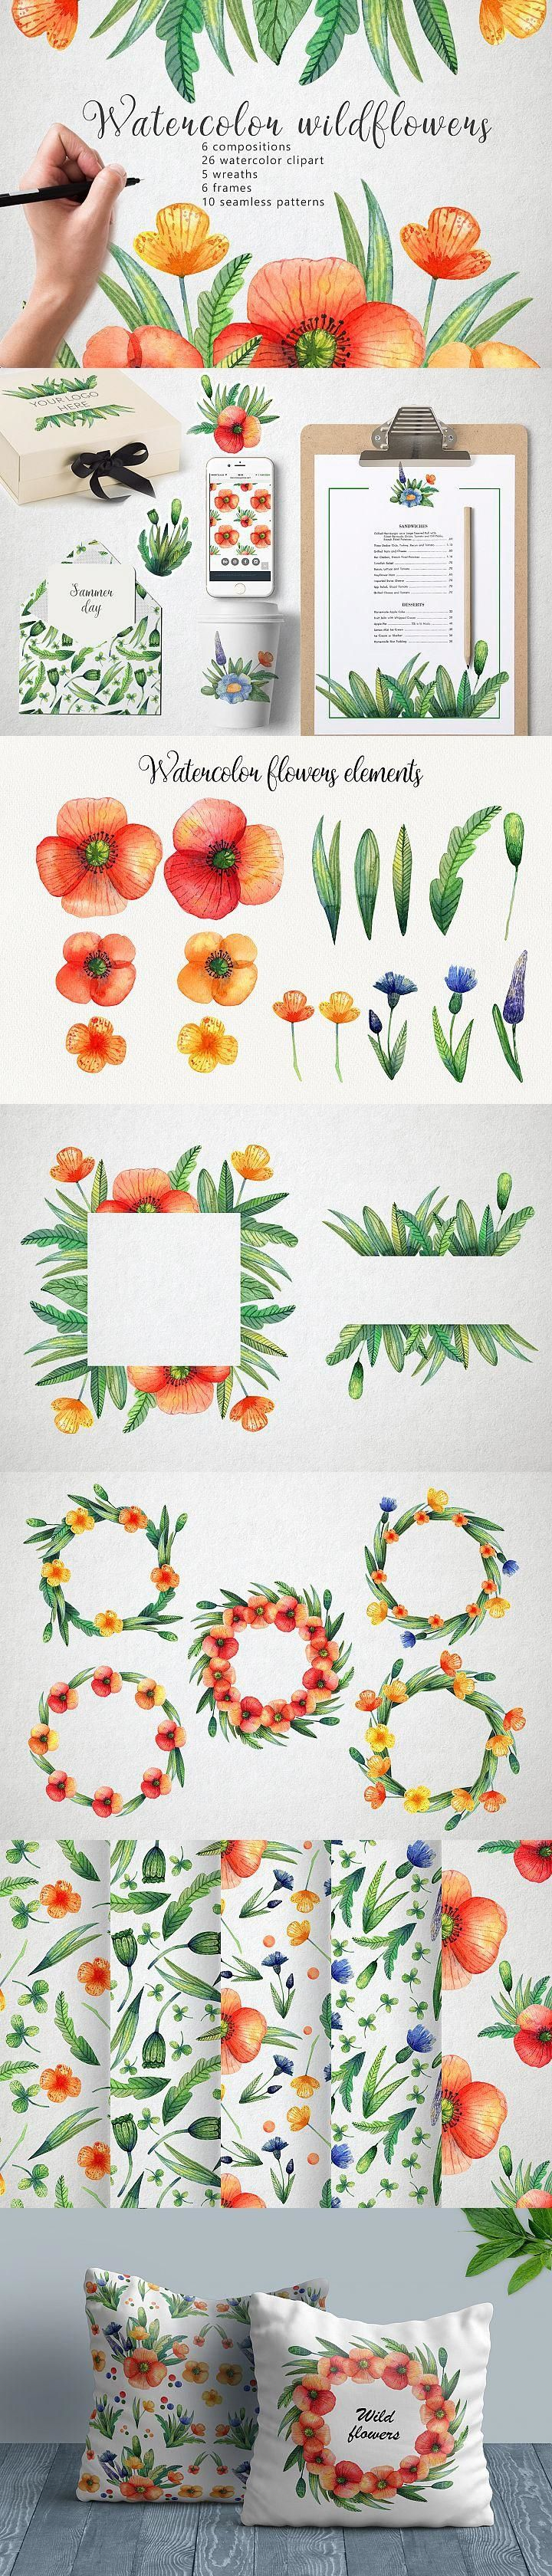 Photo of FREE ILLUSTRATIONS: Watercolor Wildflowers #flower #freedesign #flower #illustra…